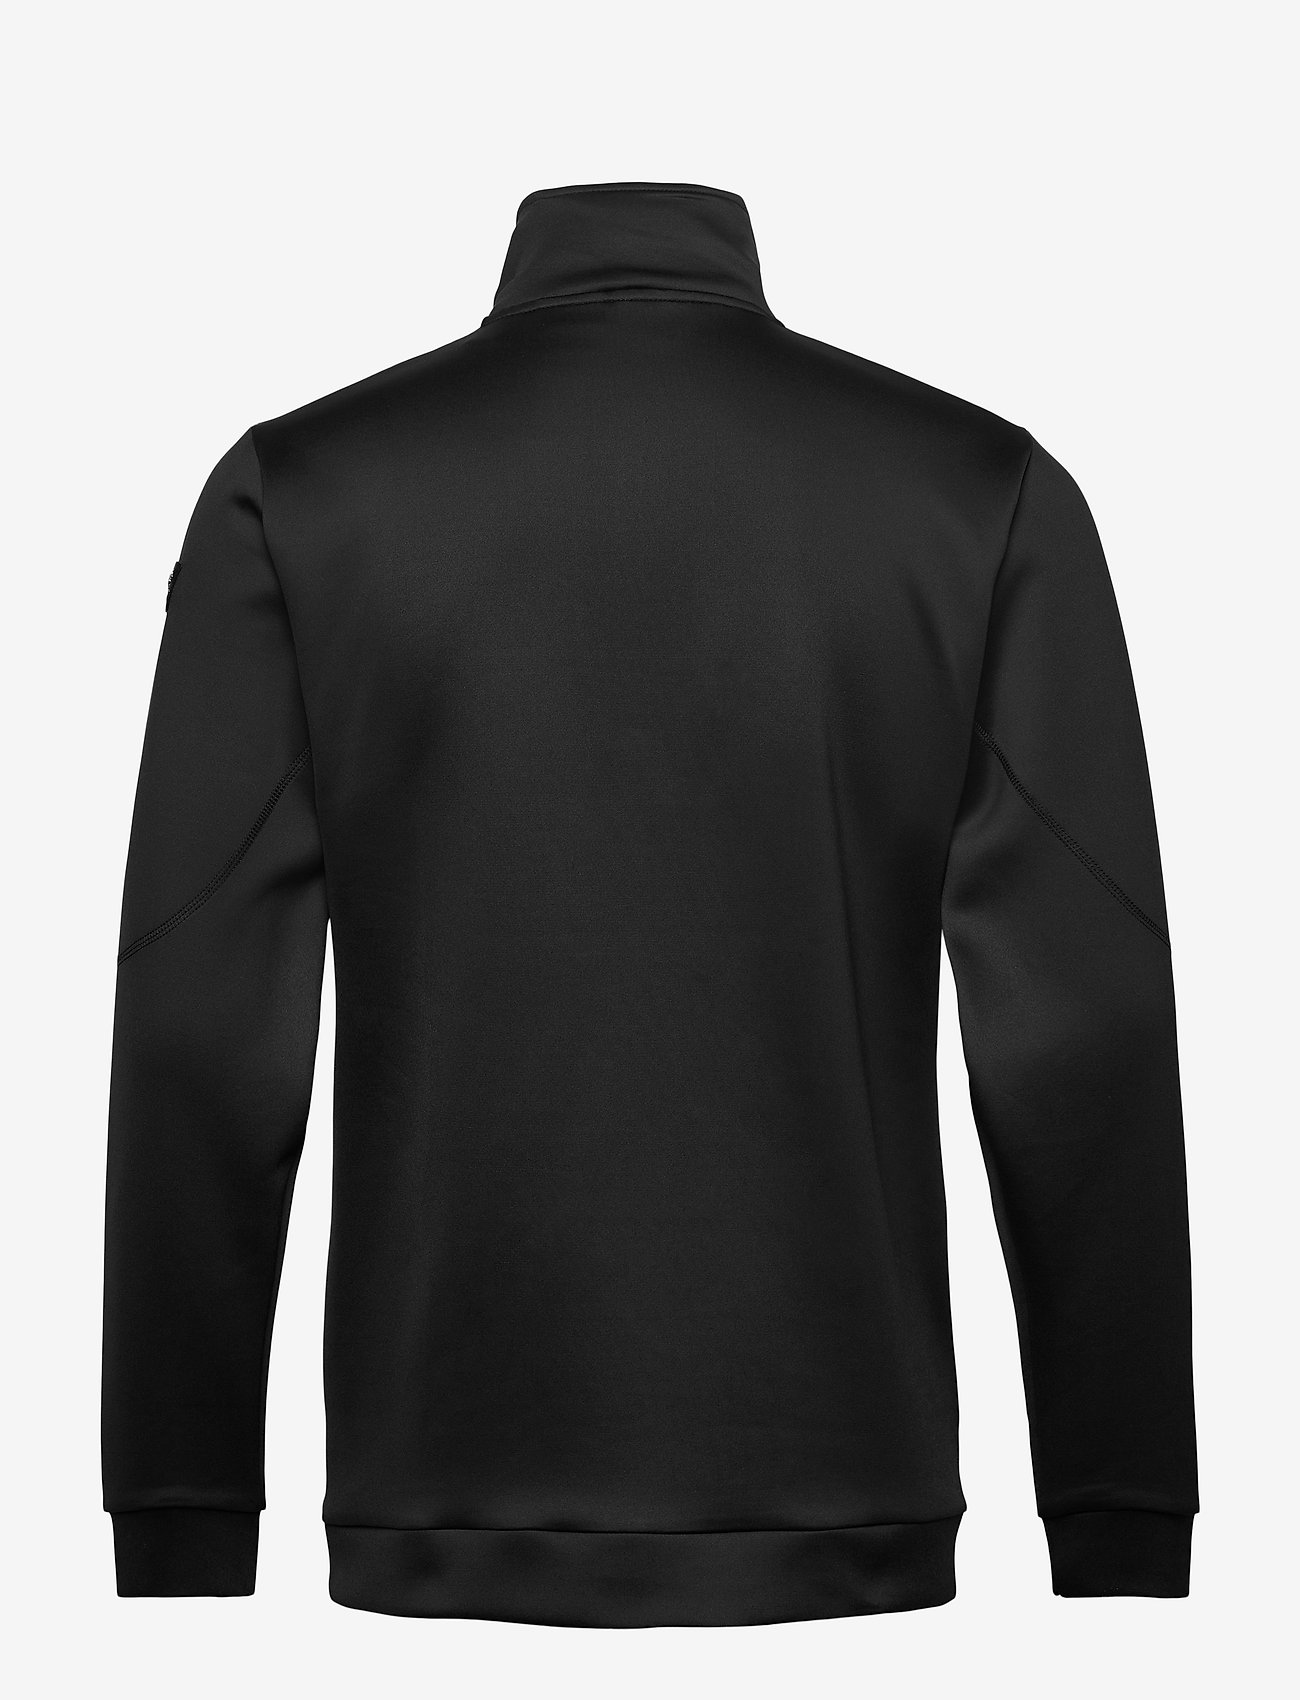 O'Neill - PM RIDERS TECH FZ FLEECE - basic-sweatshirts - black out - 1